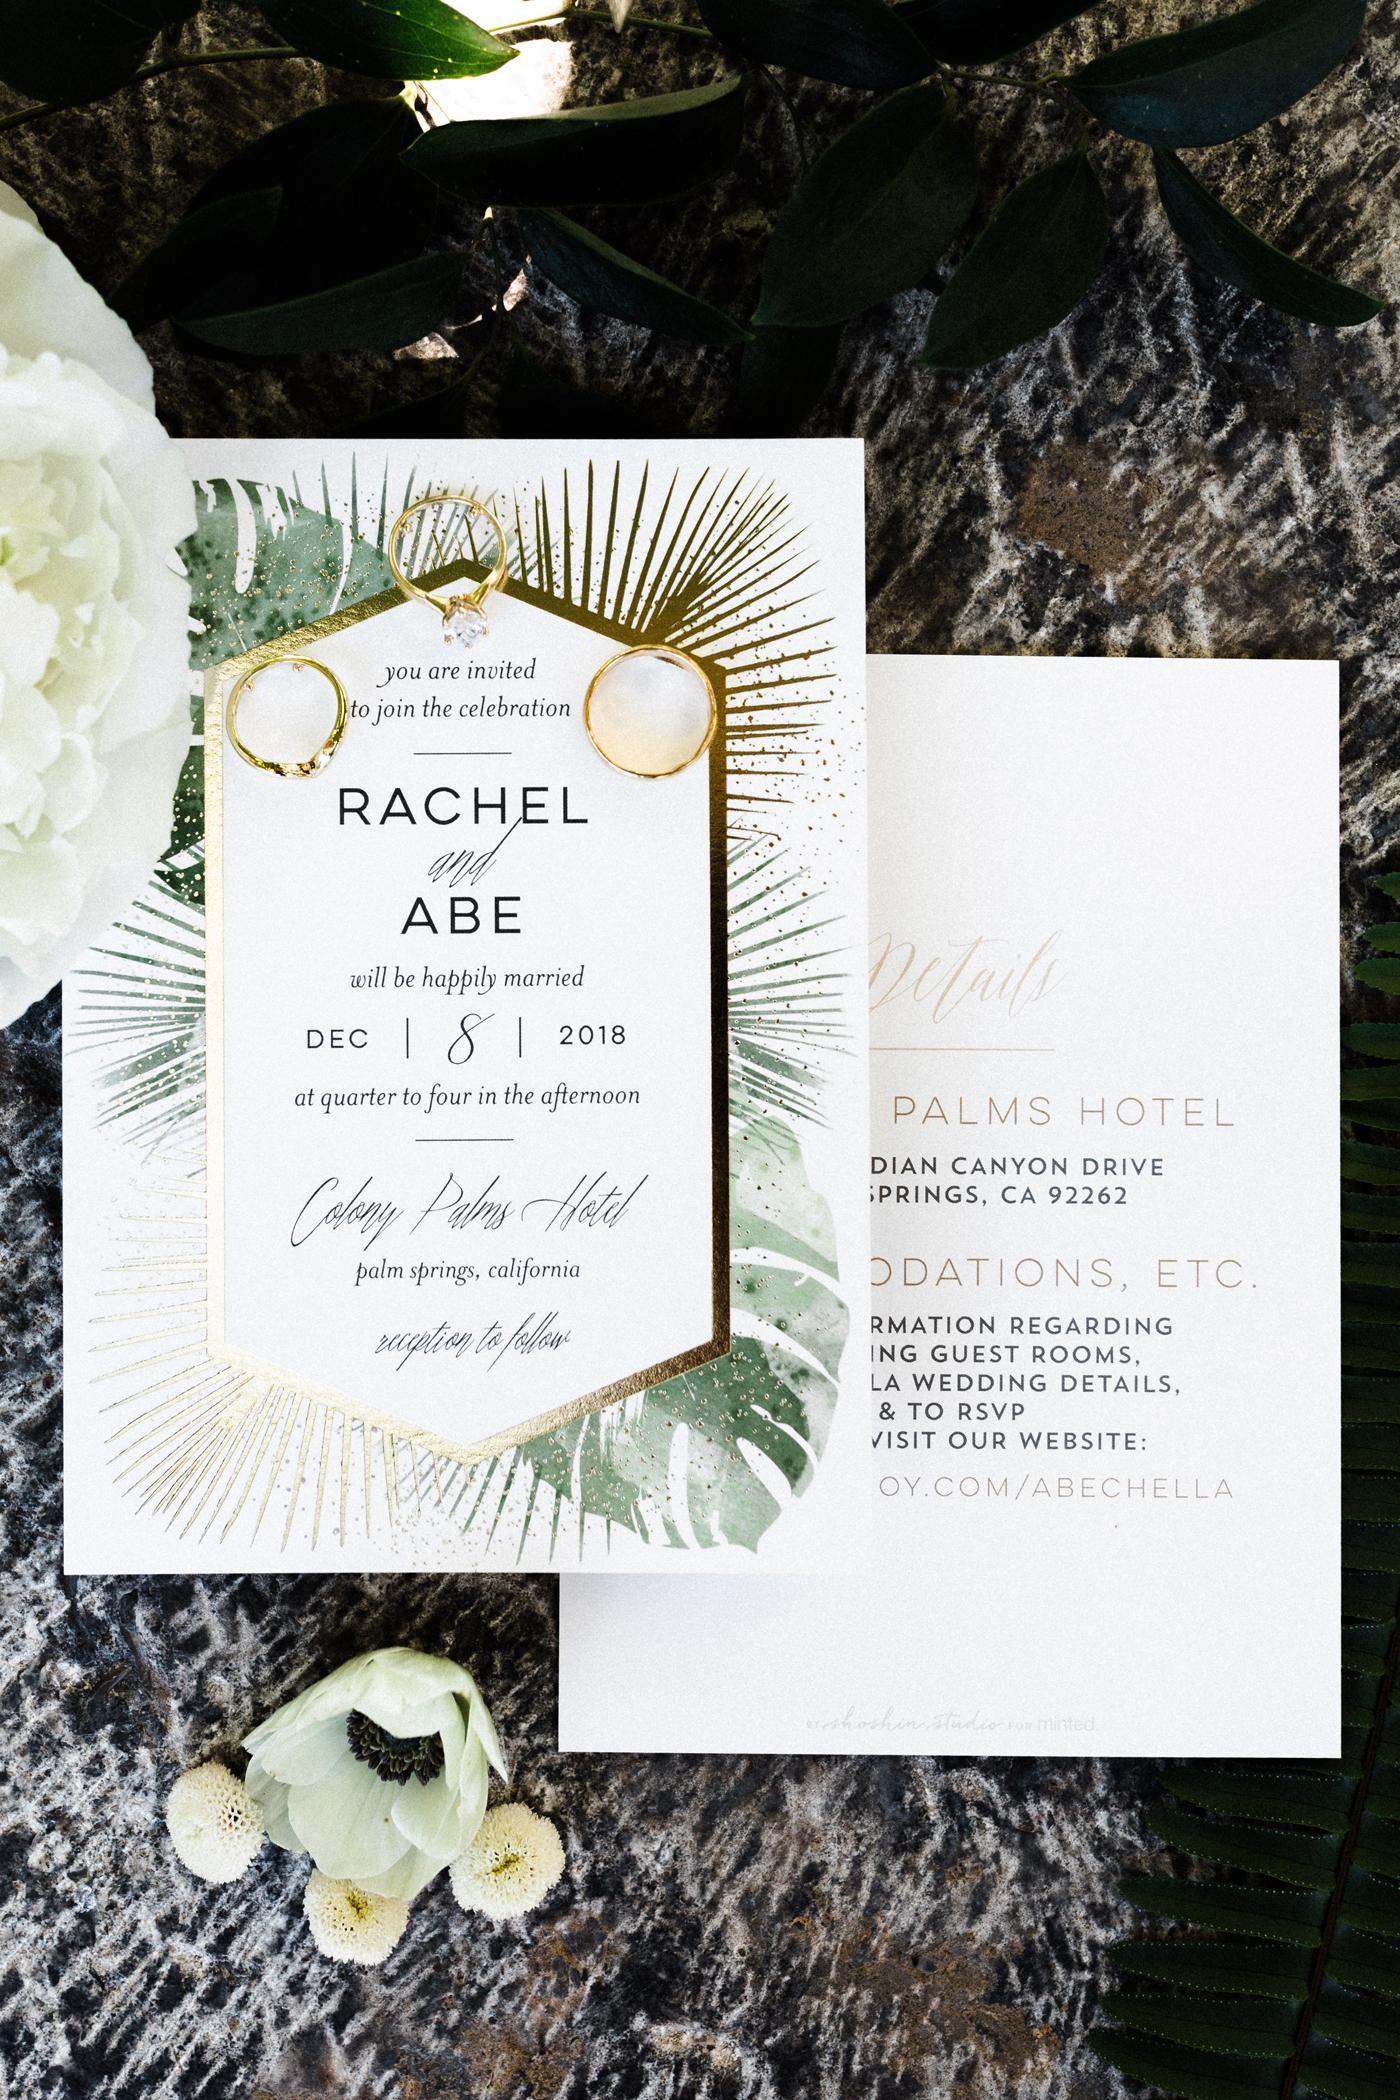 RachelAndAbeWedding-33_1.jpg